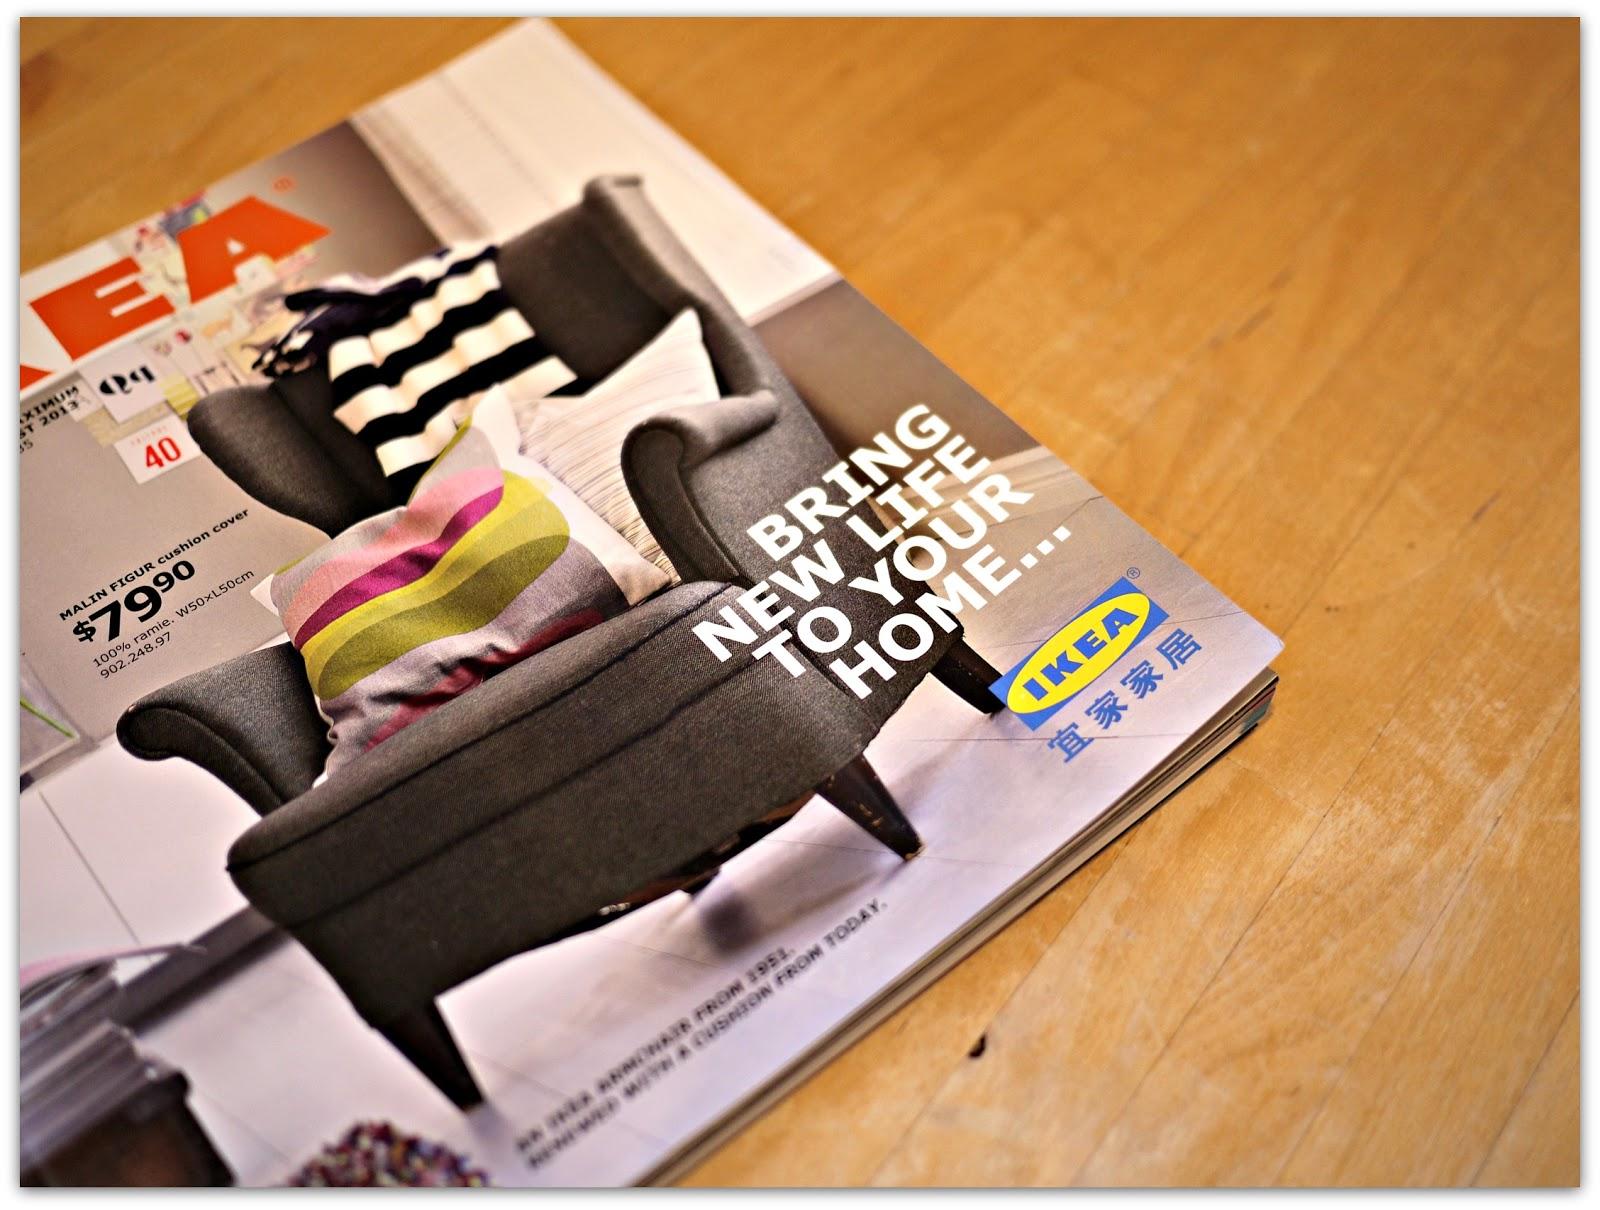 ikea hong kong Ikea kowloon bay telford plaza ii l3,  hong kong store hours  safety, textiles products, bathroom textiles, bedroom textiles, ikea hongkong, ikea hong kong .